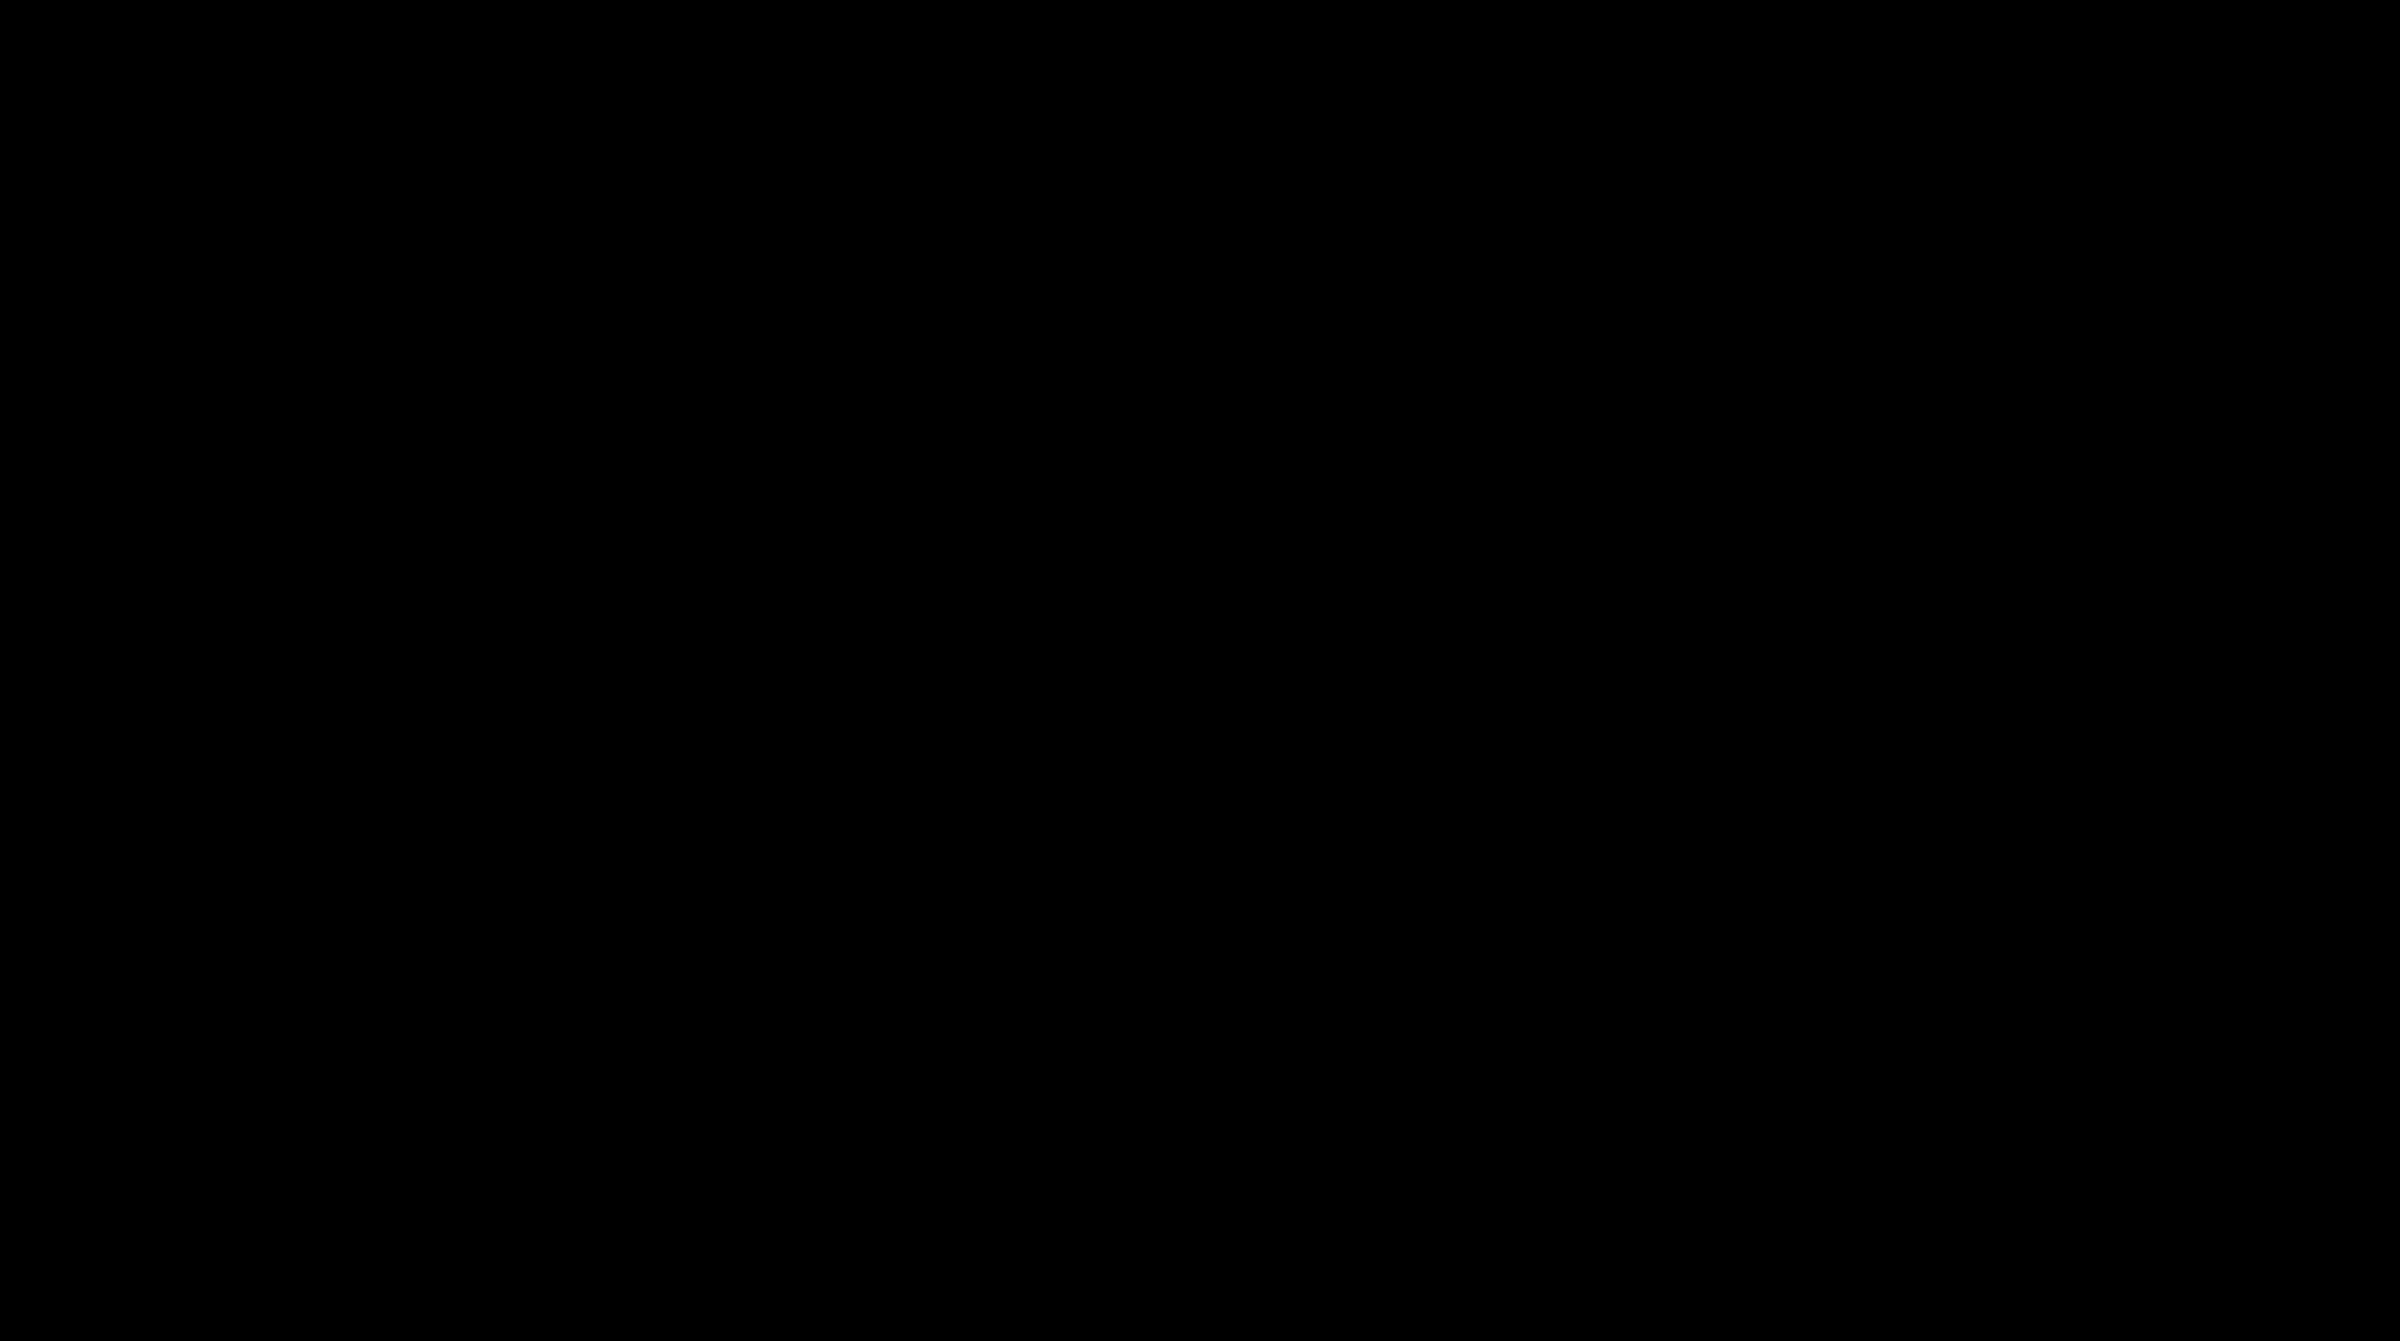 clip transparent stock Clipart